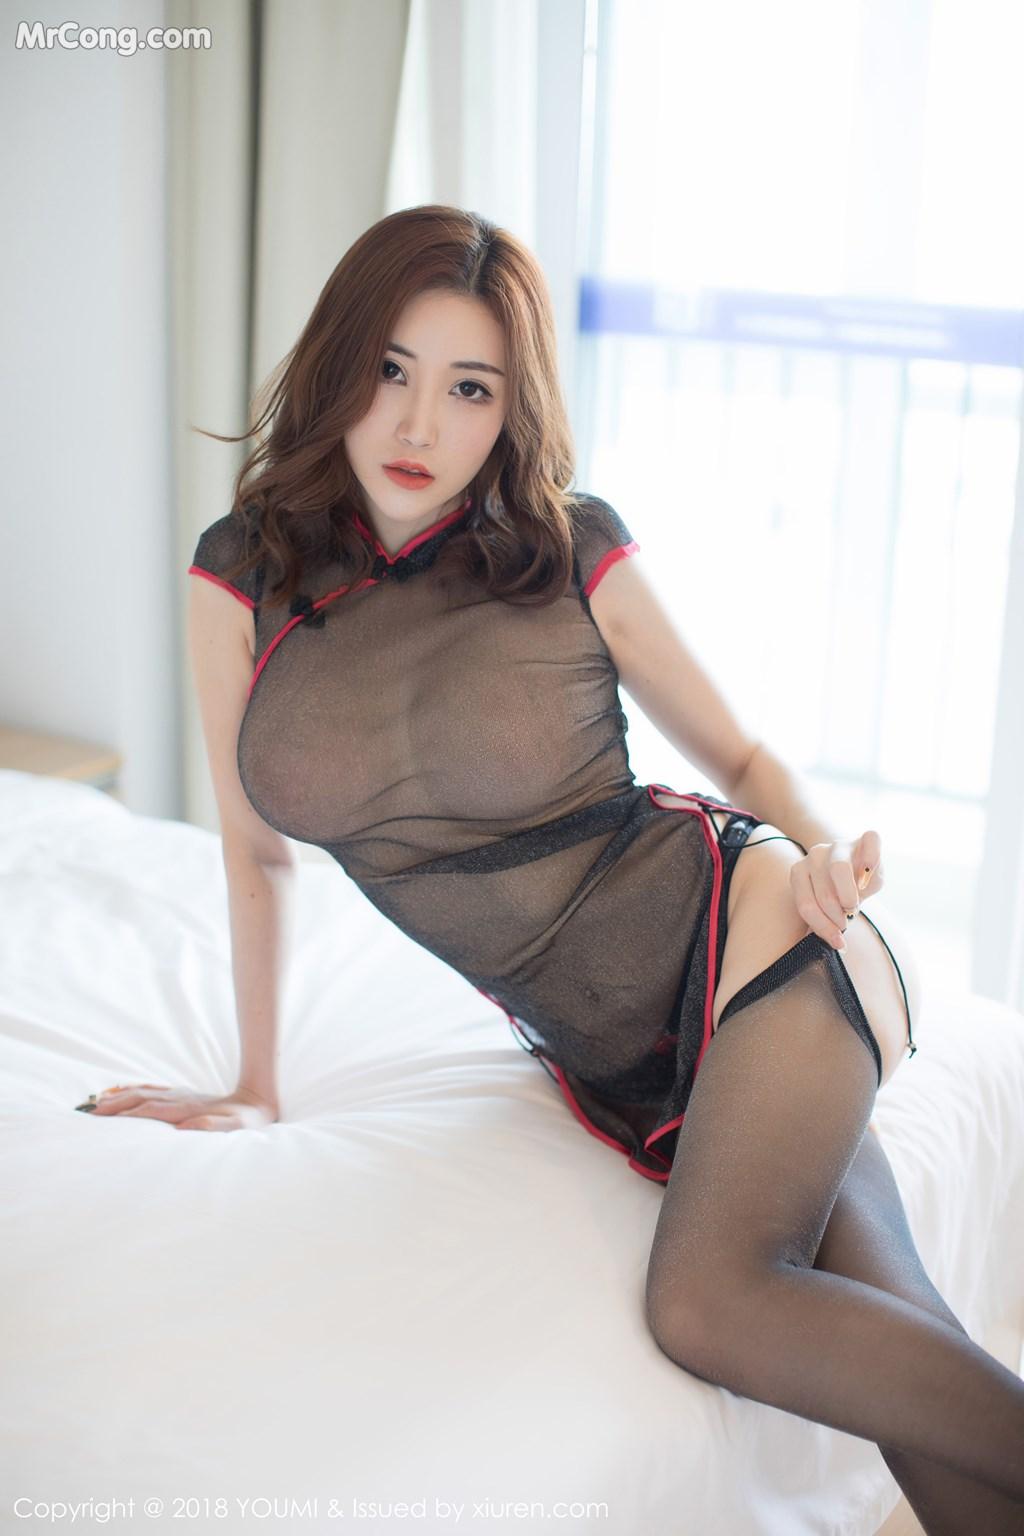 Image YouMi-Vol.236-Sun-Meng-Yao-V-MrCong.com-002 in post YouMi Vol.236: Người mẫu Sun Meng Yao (孙梦瑶V) (47 ảnh)